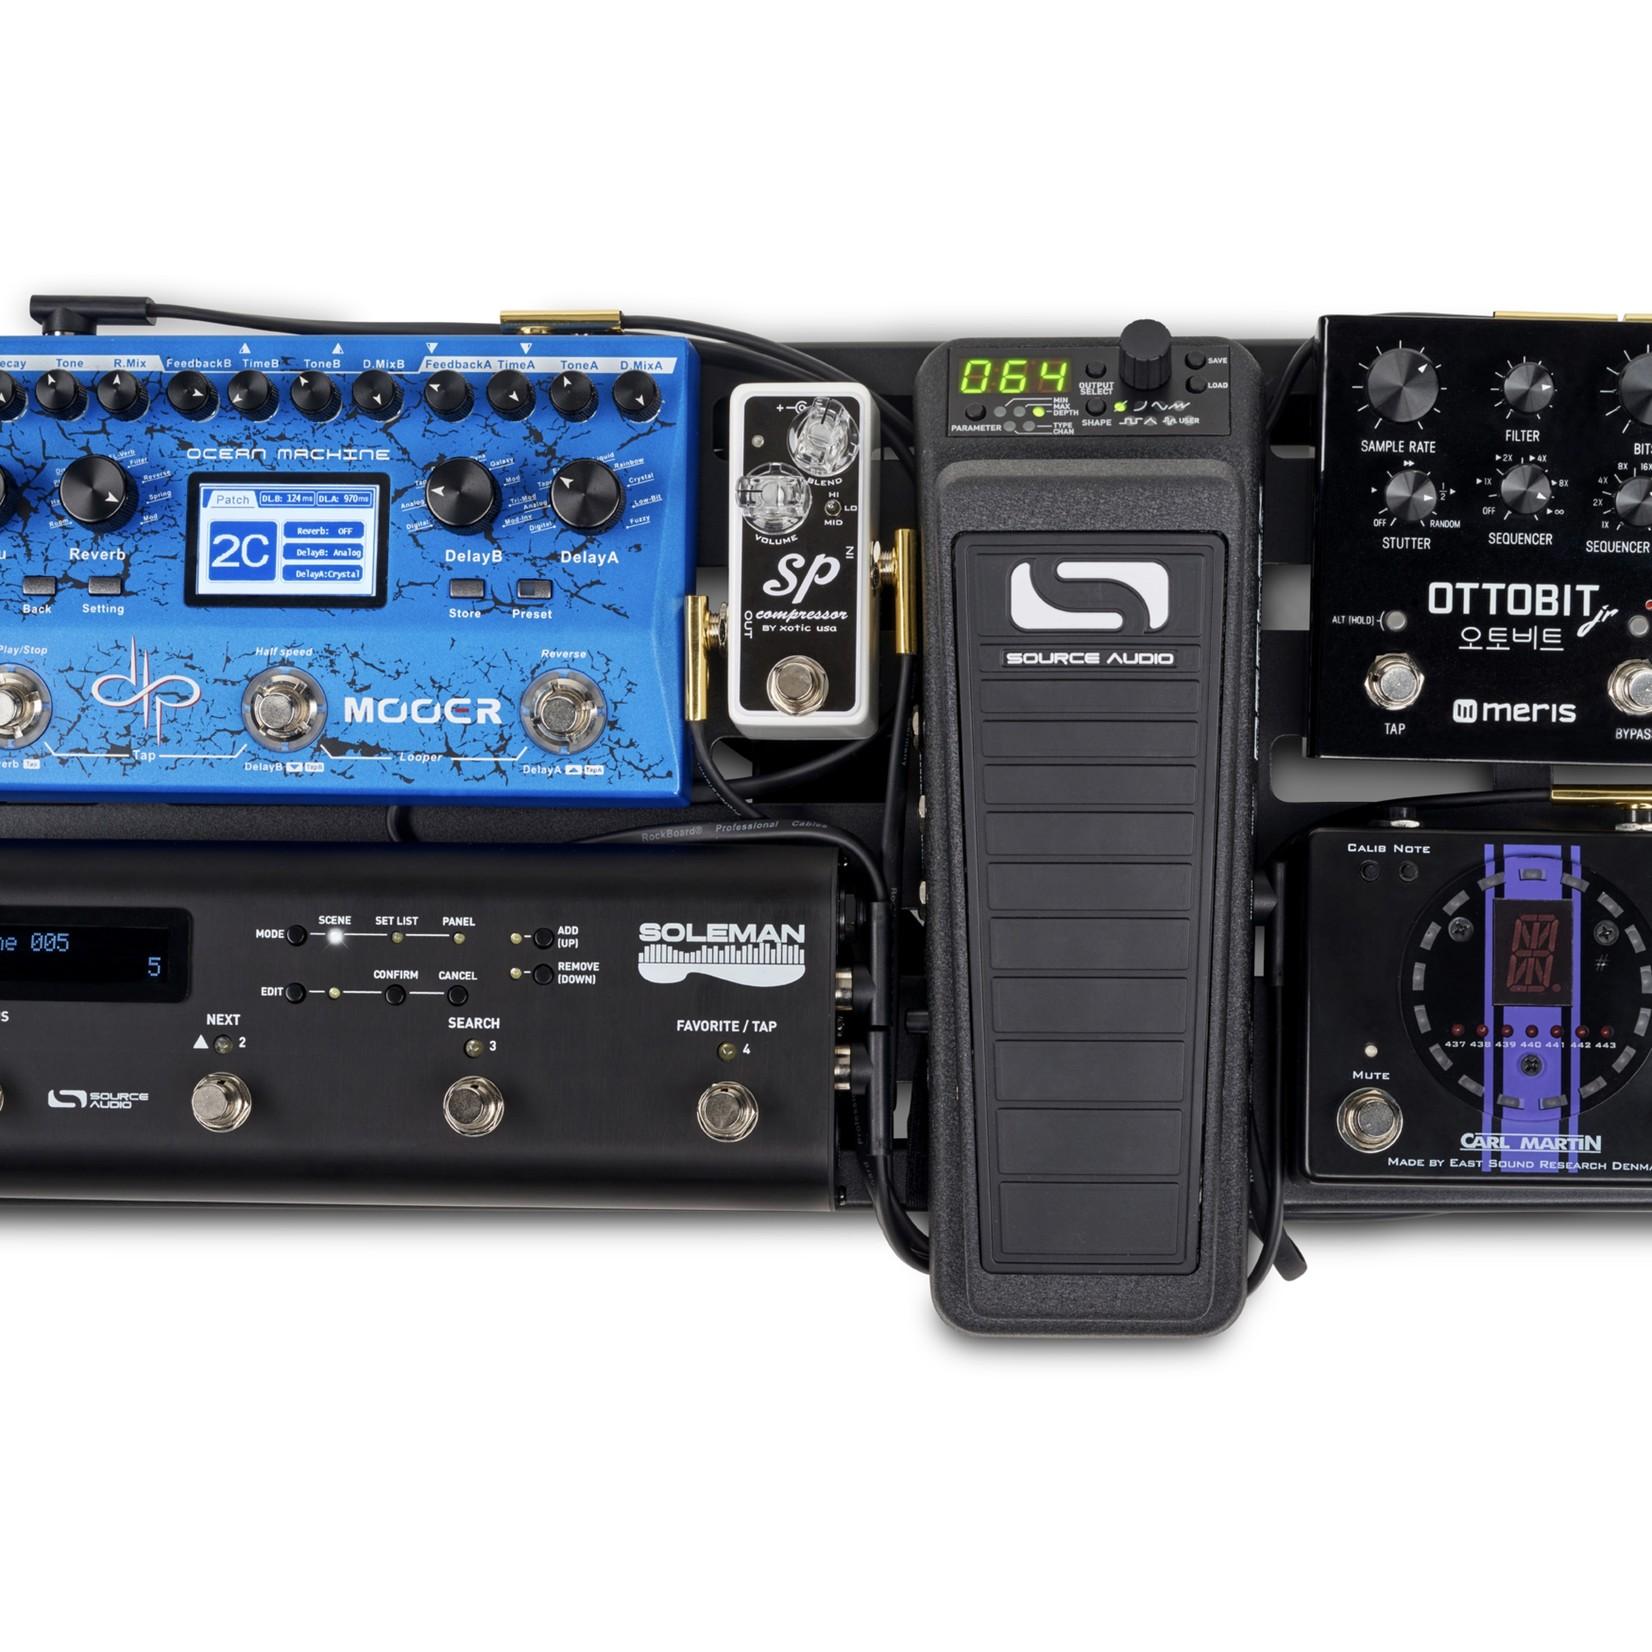 "Rockboard Rockboard Flat MIDI Cable - 100 cm (39 3/8""), Black , Angled Plugs"